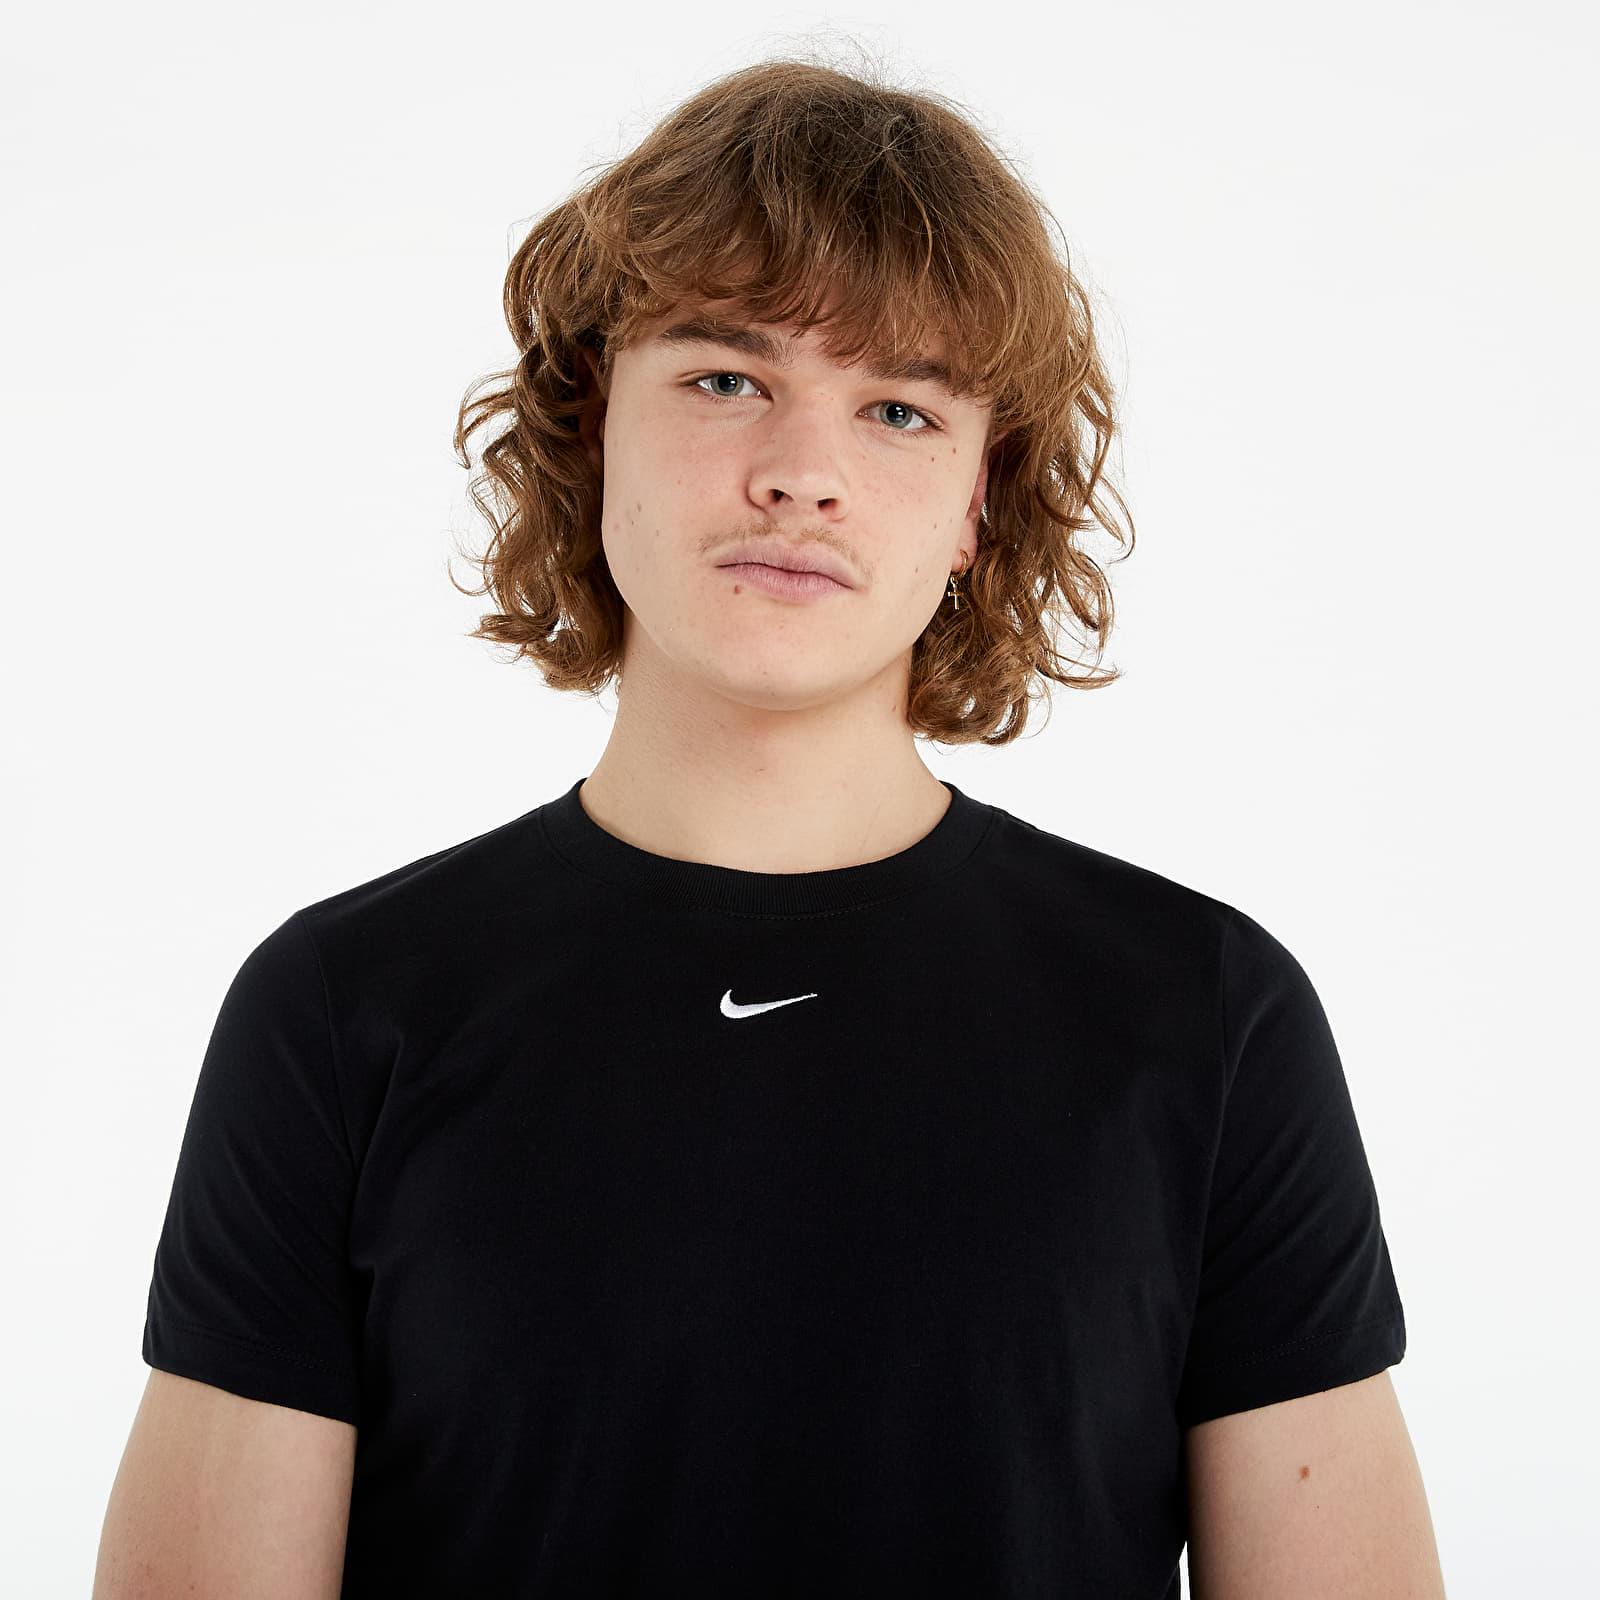 Nike Sportswear Essential Tee Crew Lbr Black/ White S